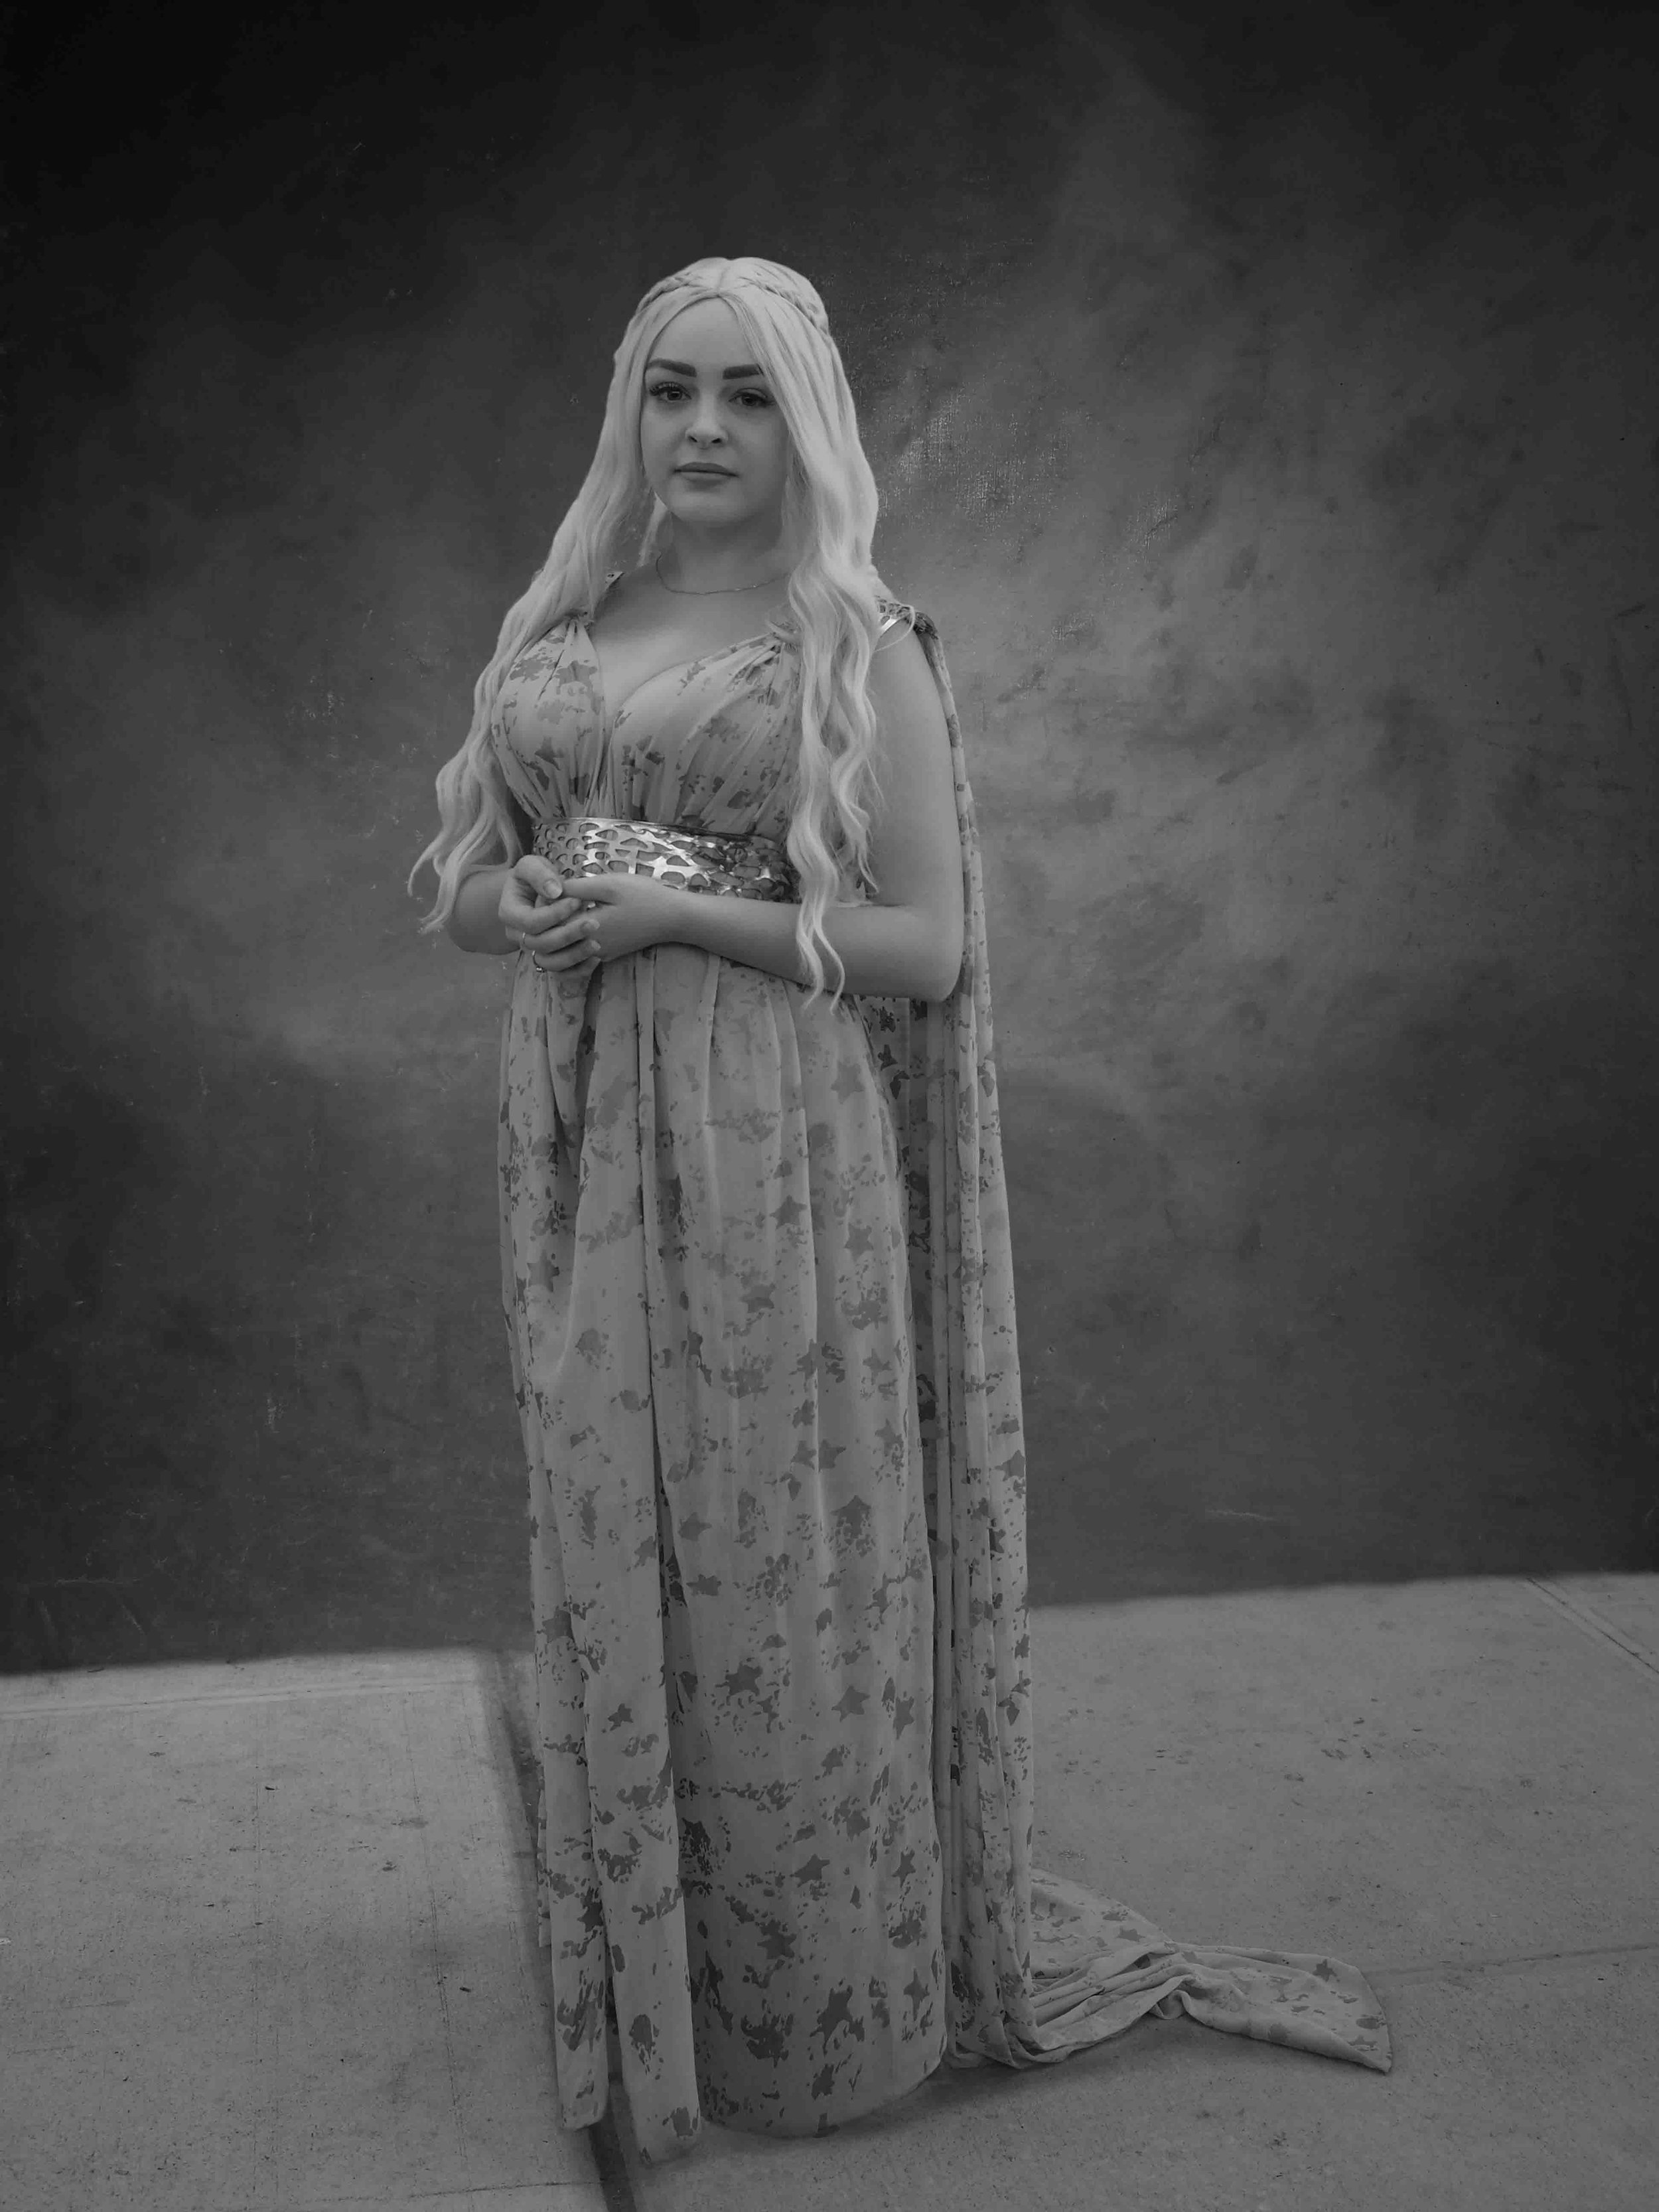 Daenerys Targaryen - Inspired by Game of ThronesHer Full Title as of Season 7 is: